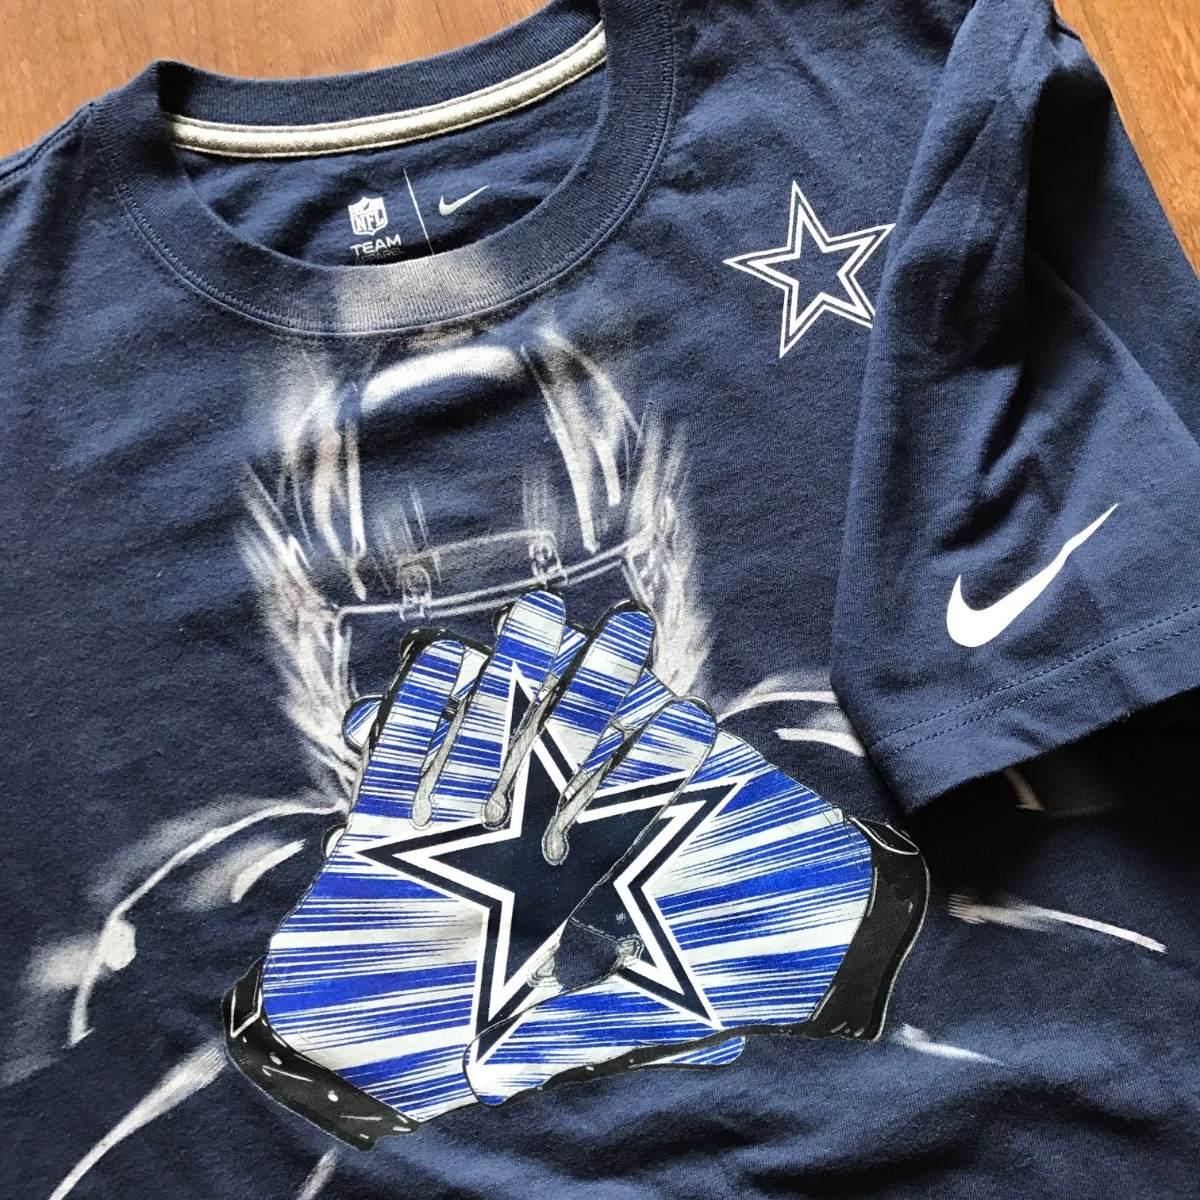 57a3940c0b camiseta dallas cowboys nike nfl camisa futebol americano. Carregando zoom.